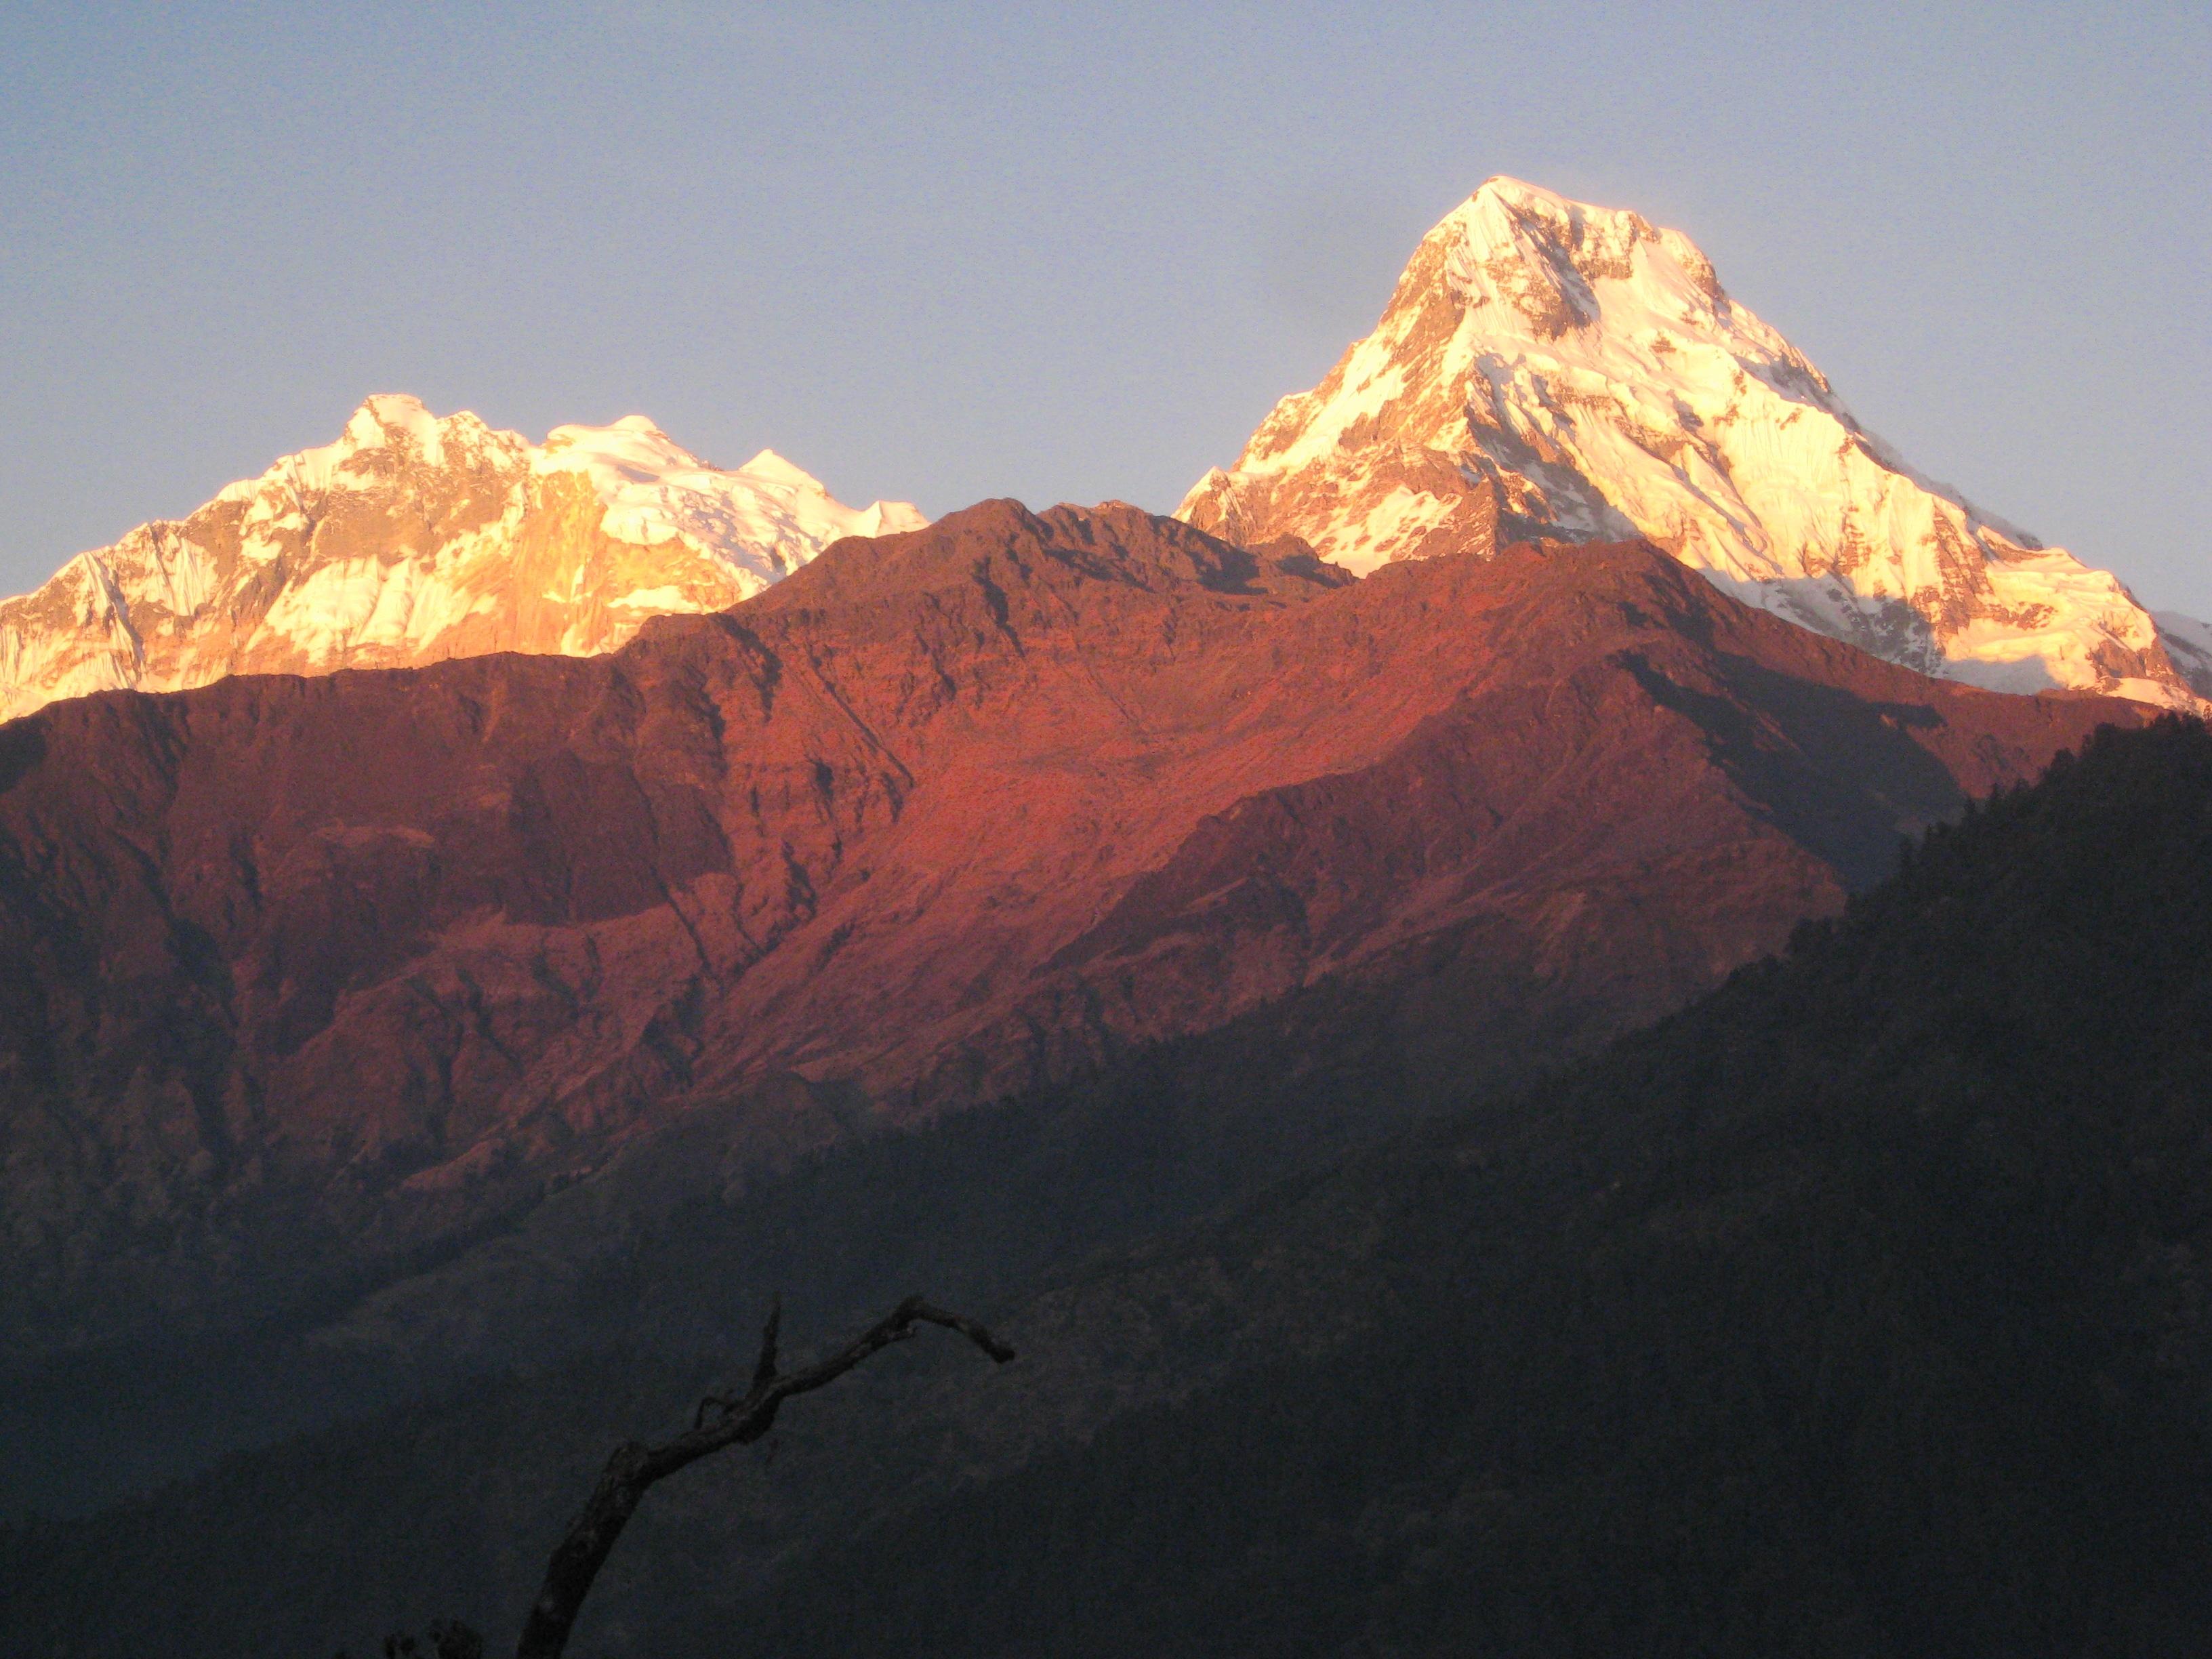 Poon Hill Trek 3 days - Sunset view Annapurna mountain range.